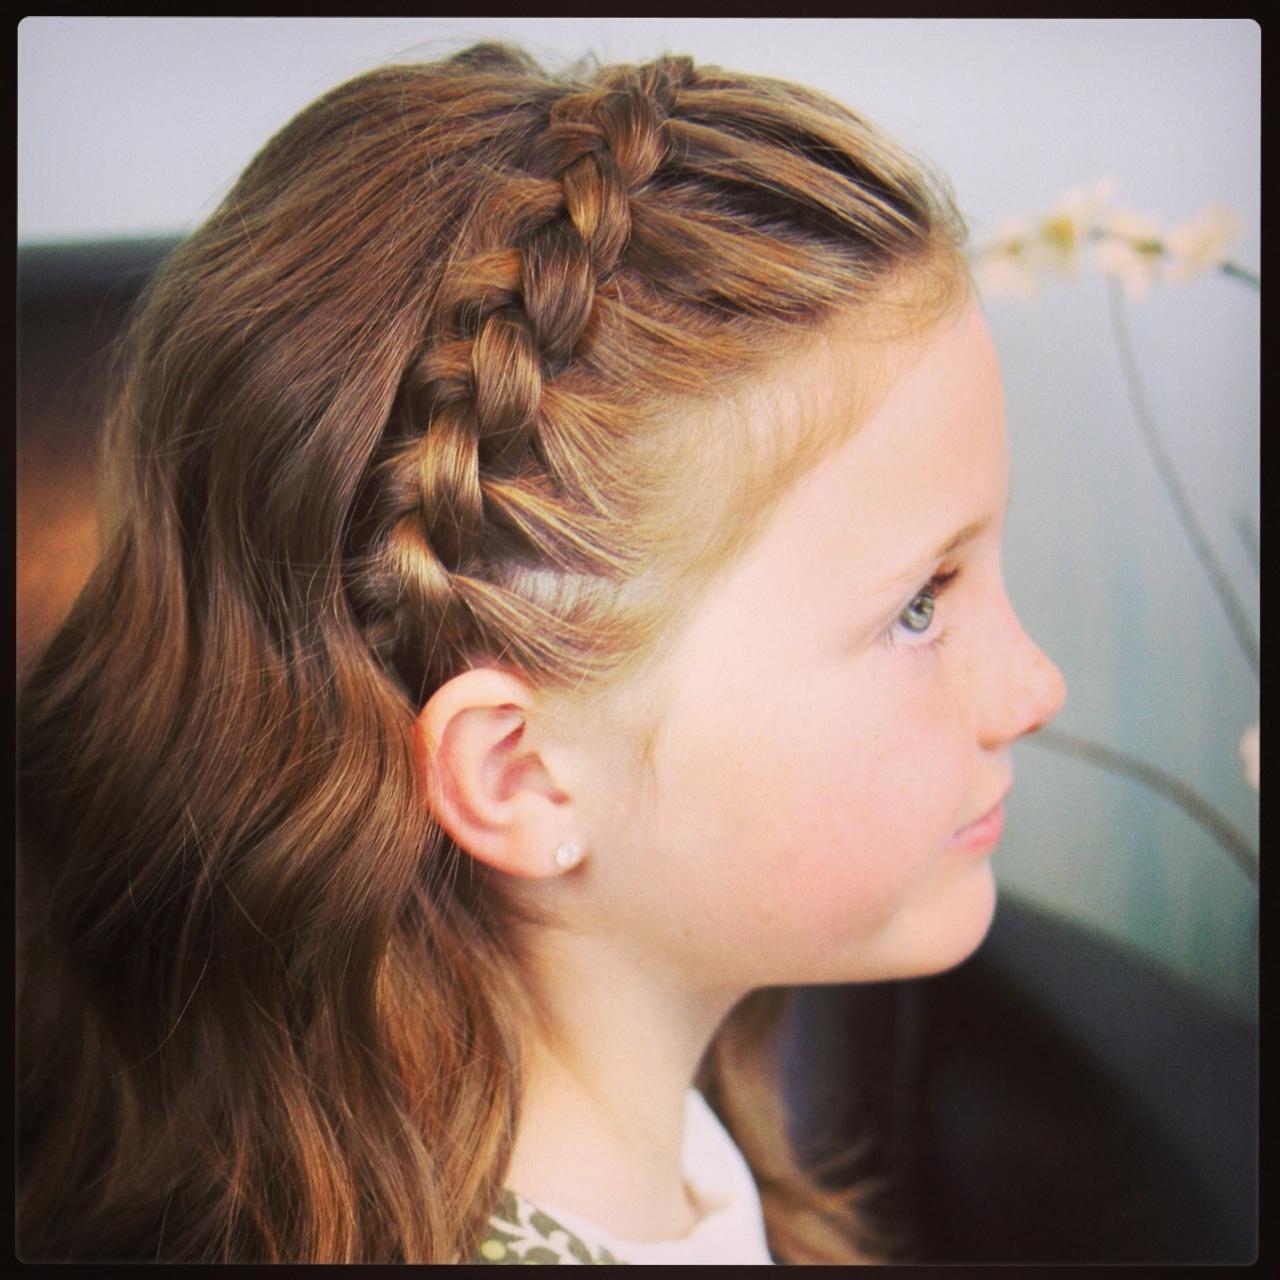 dutch-lace-braided-headband-braid-hairstyles-cute-girls-hairstyles-intended-for-headband-hairstyles-v-cut-and-u-cut-hairstyles